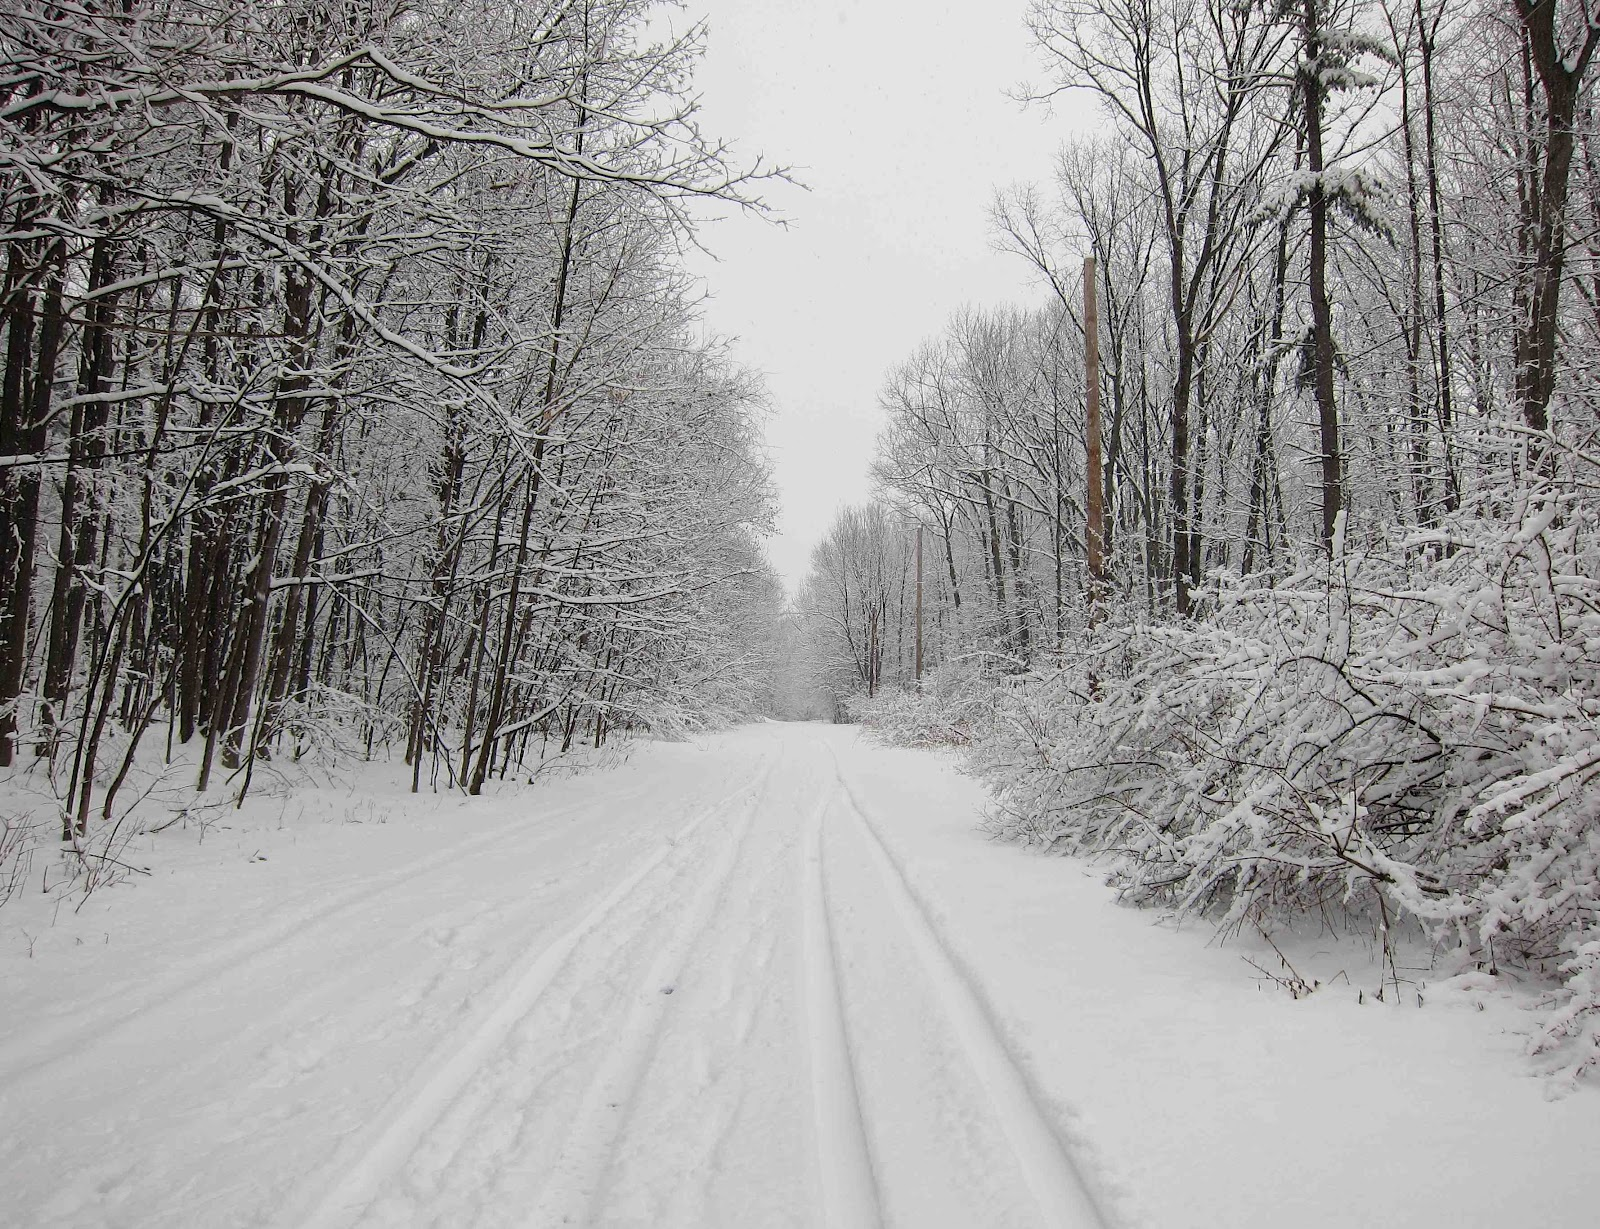 Saratoga Woods And Waterways: SNOW